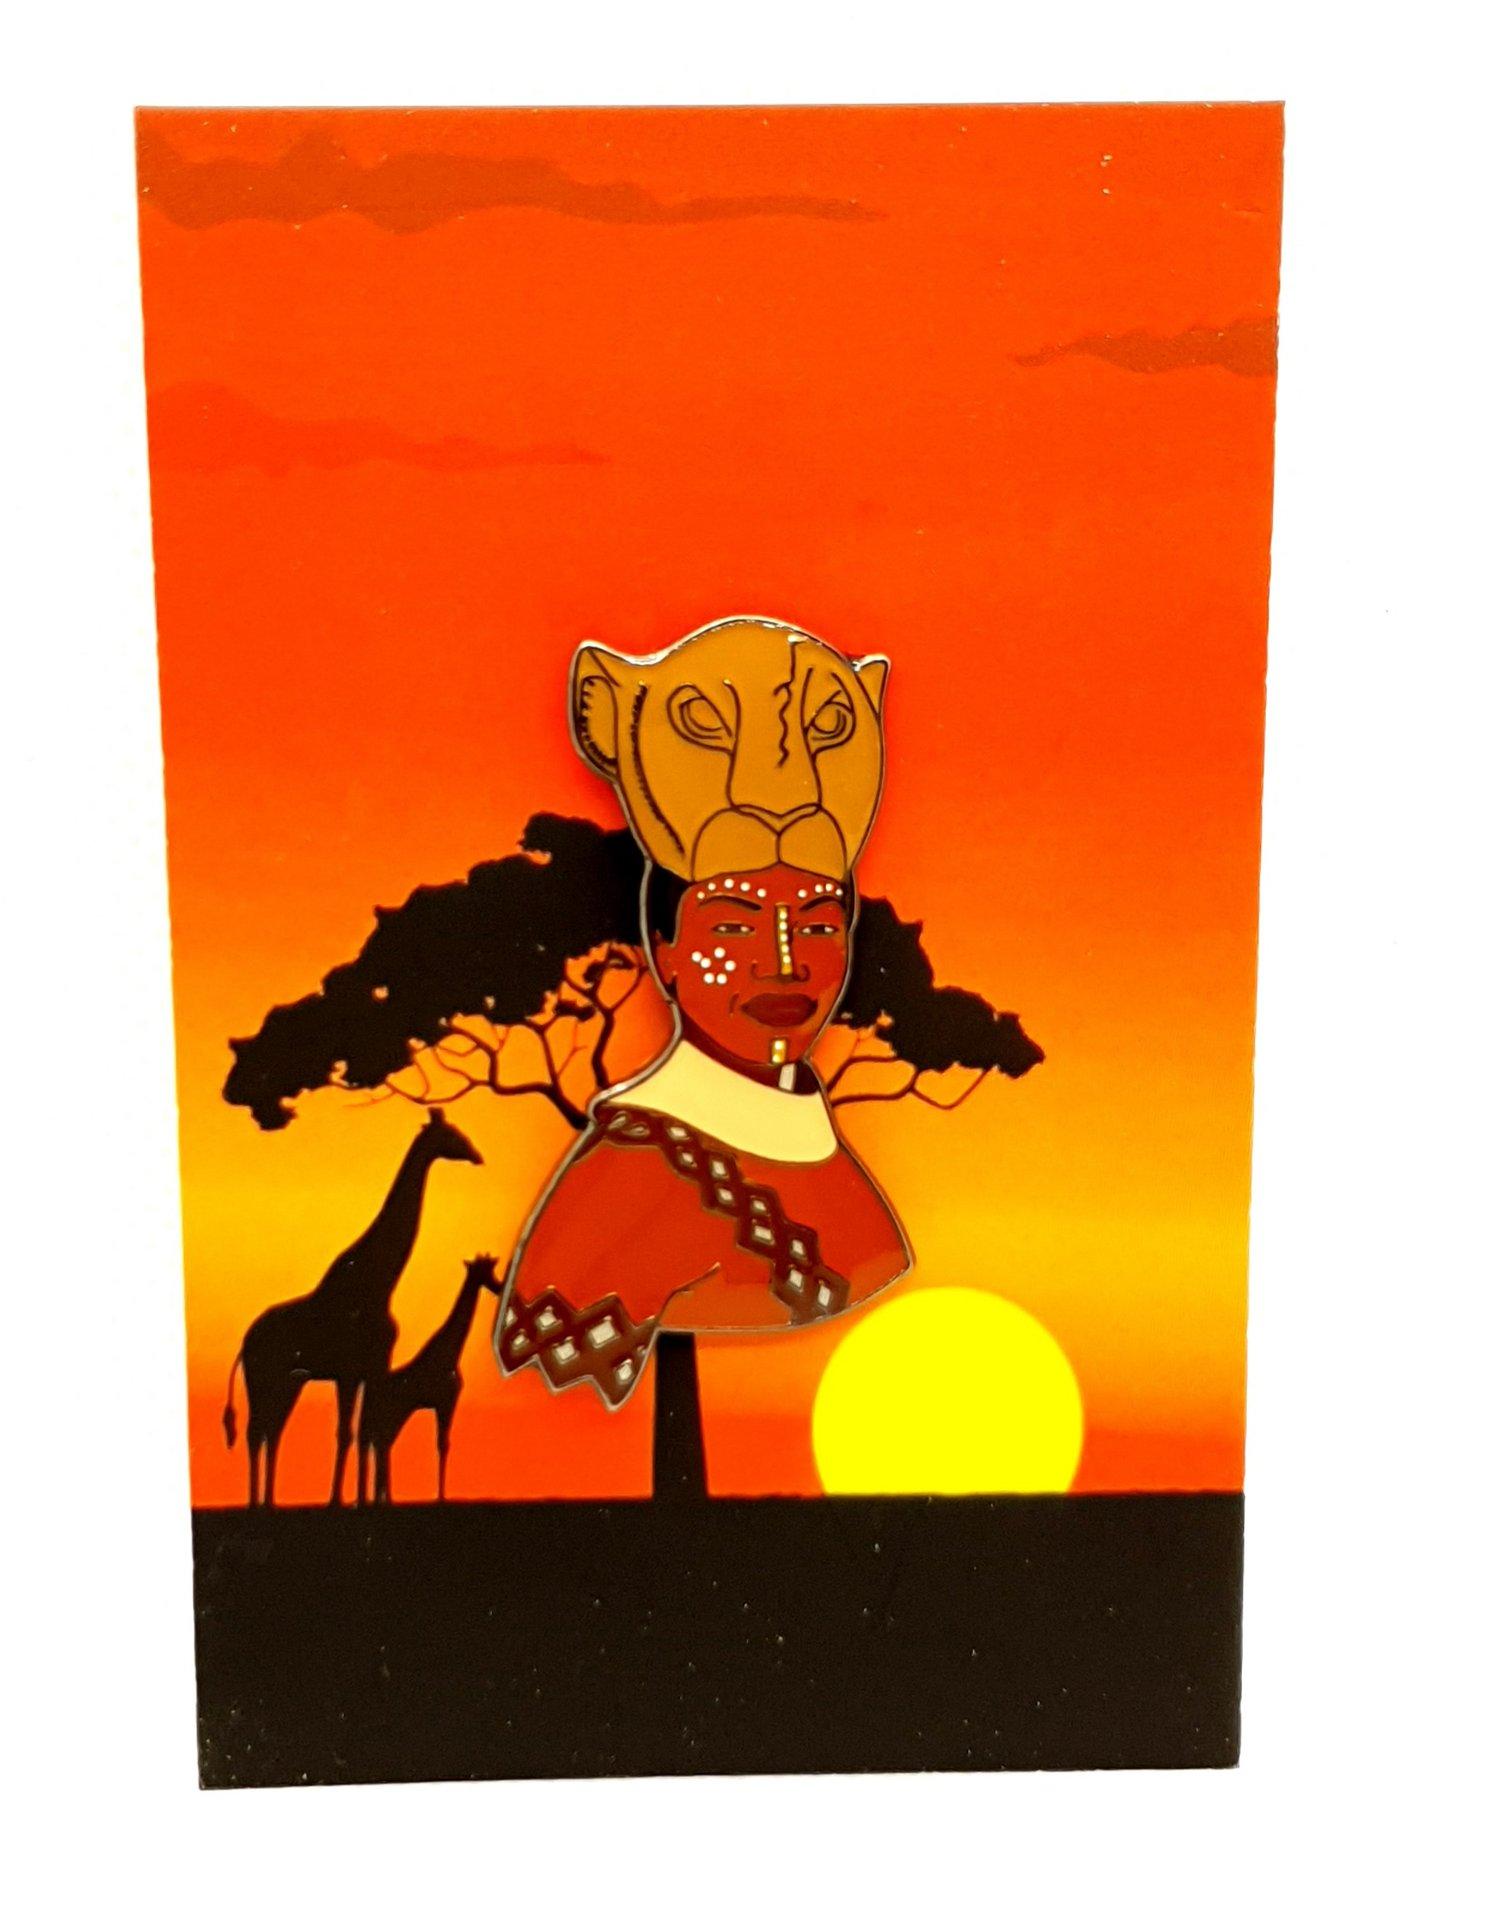 Nala From Lion King The Musical Enamel Pin